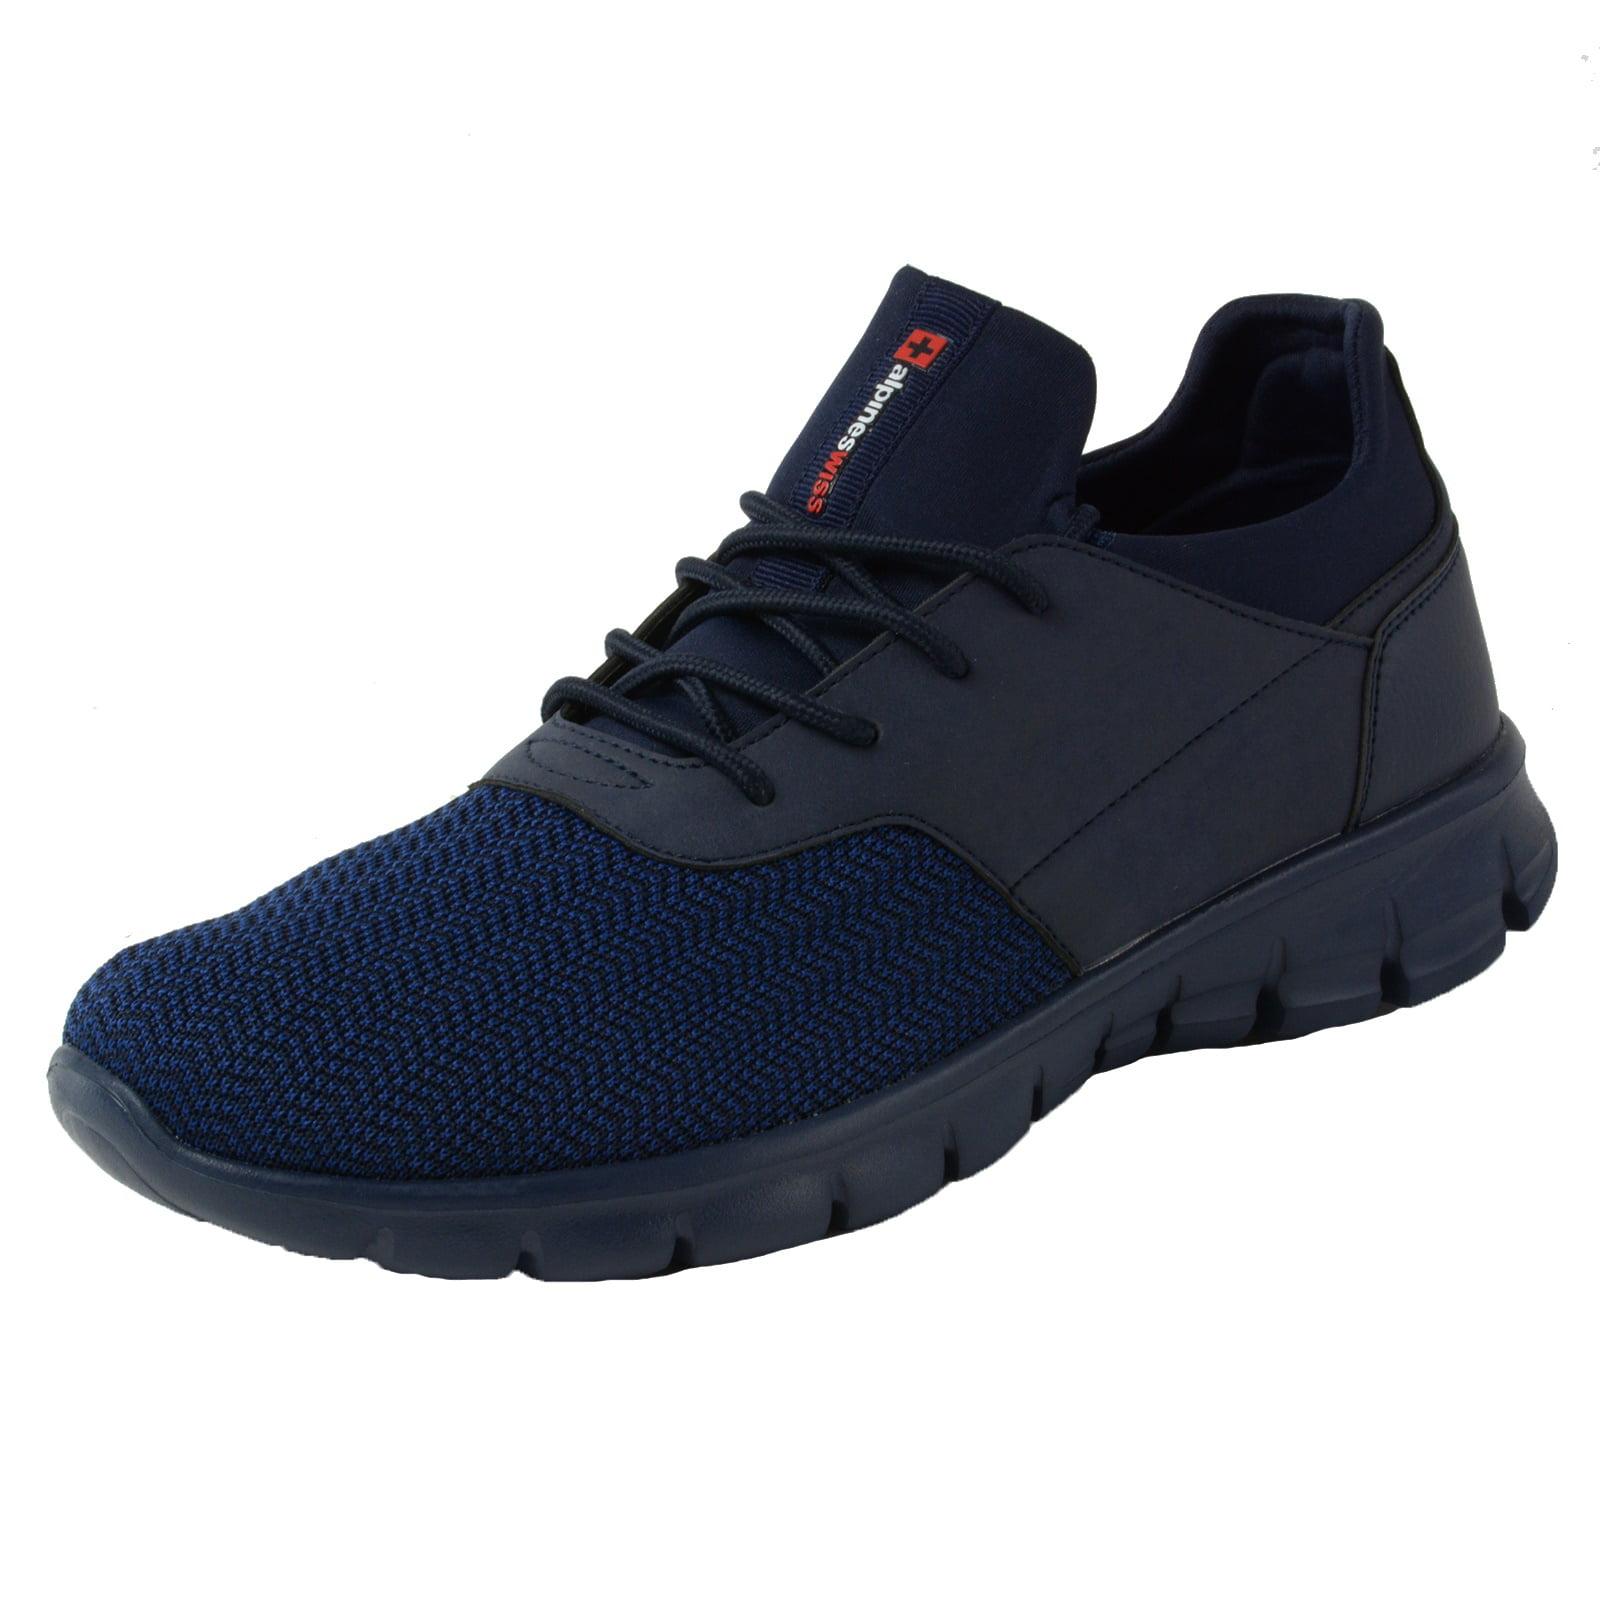 Alpine Swiss Leo Men Sneakers Flex Knit Tennis Shoes Casual Athletic Lightweight by